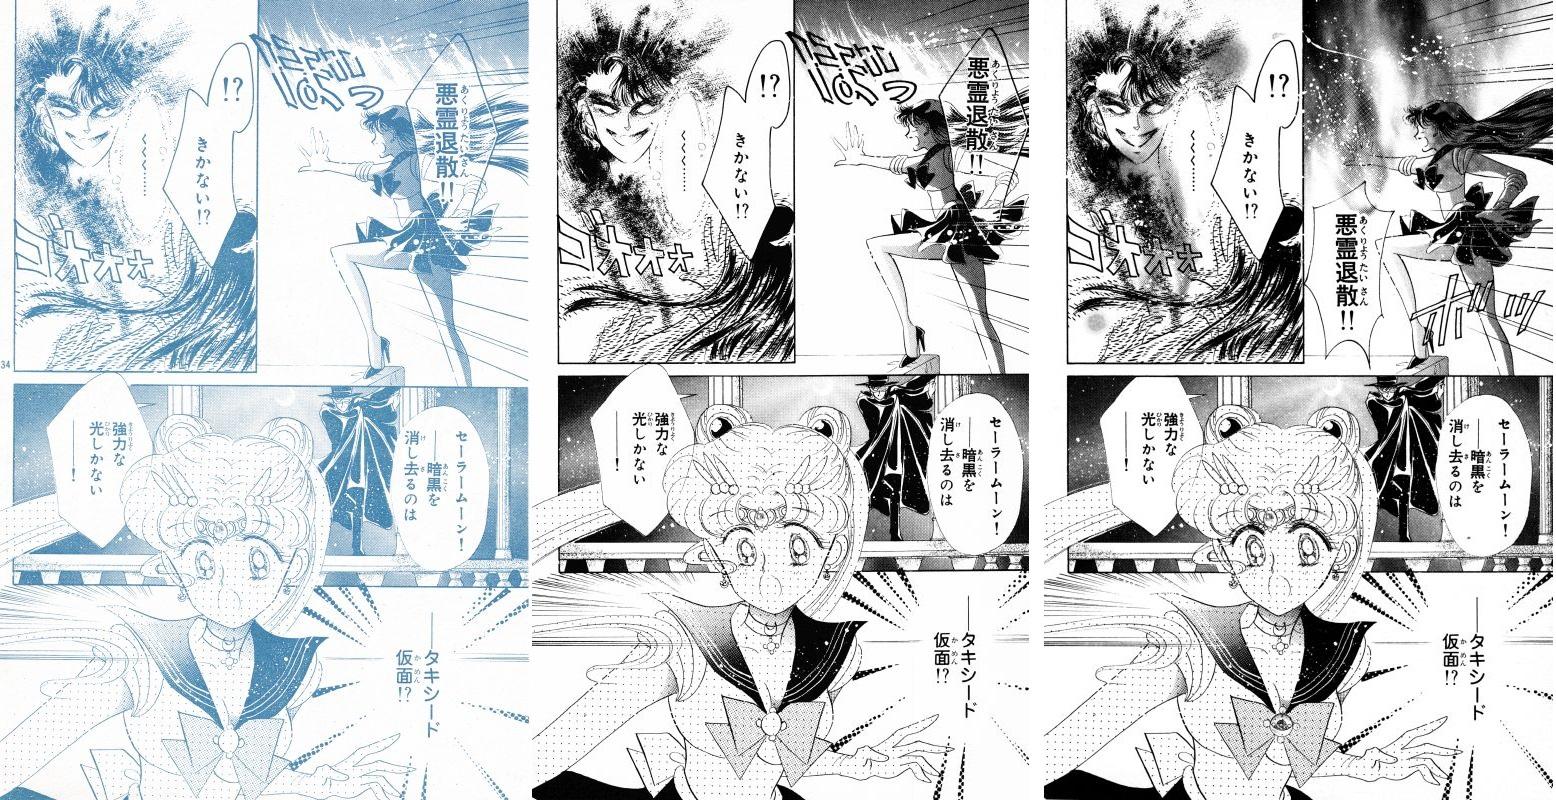 Act 4, Page 31 – Nakayoshi, Original, Remaster